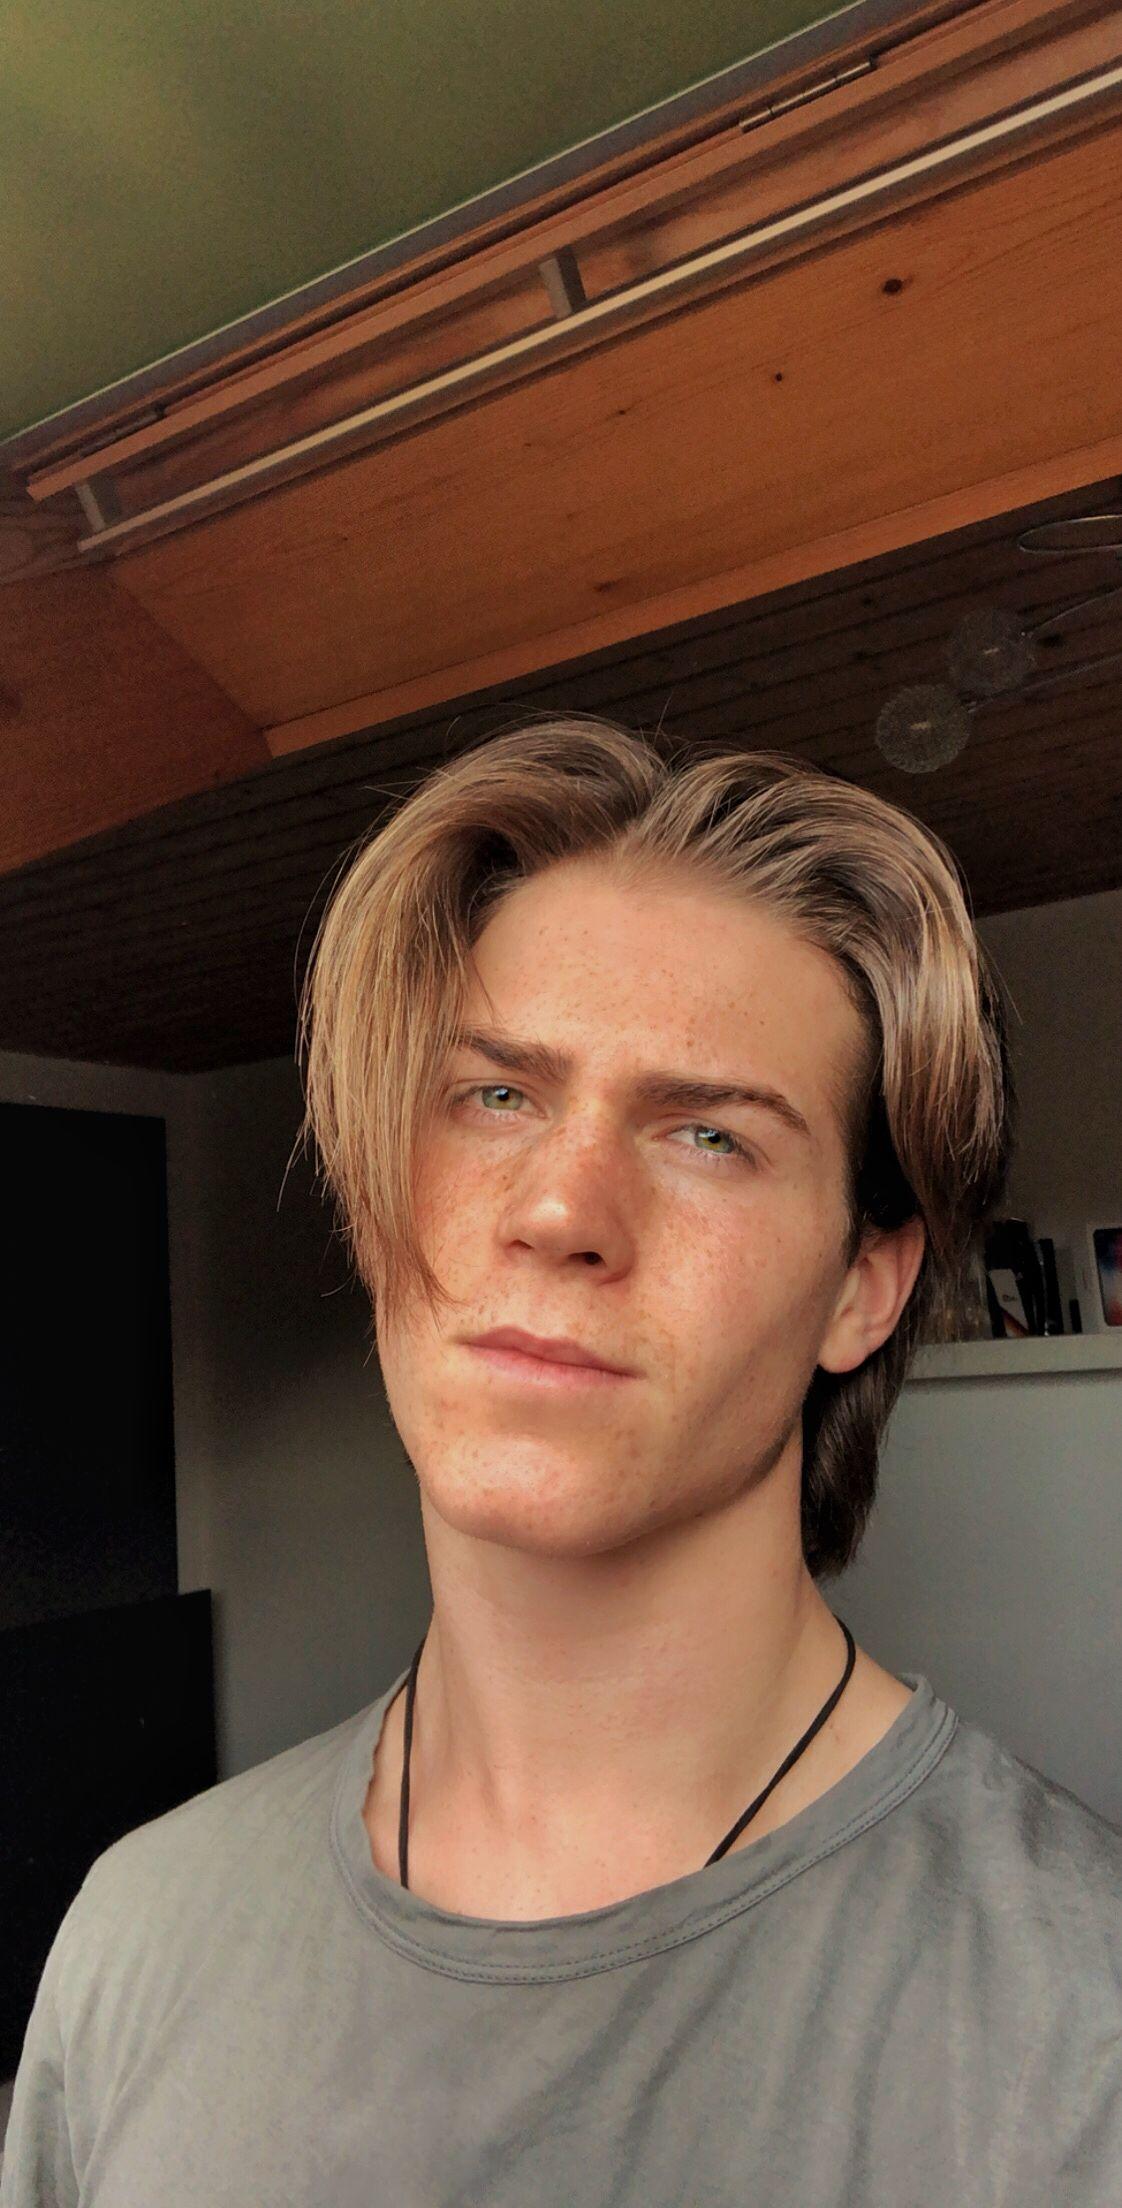 Long Hair Men Growing Long Hair Men Growing Hair Men Long Hair Styles Men